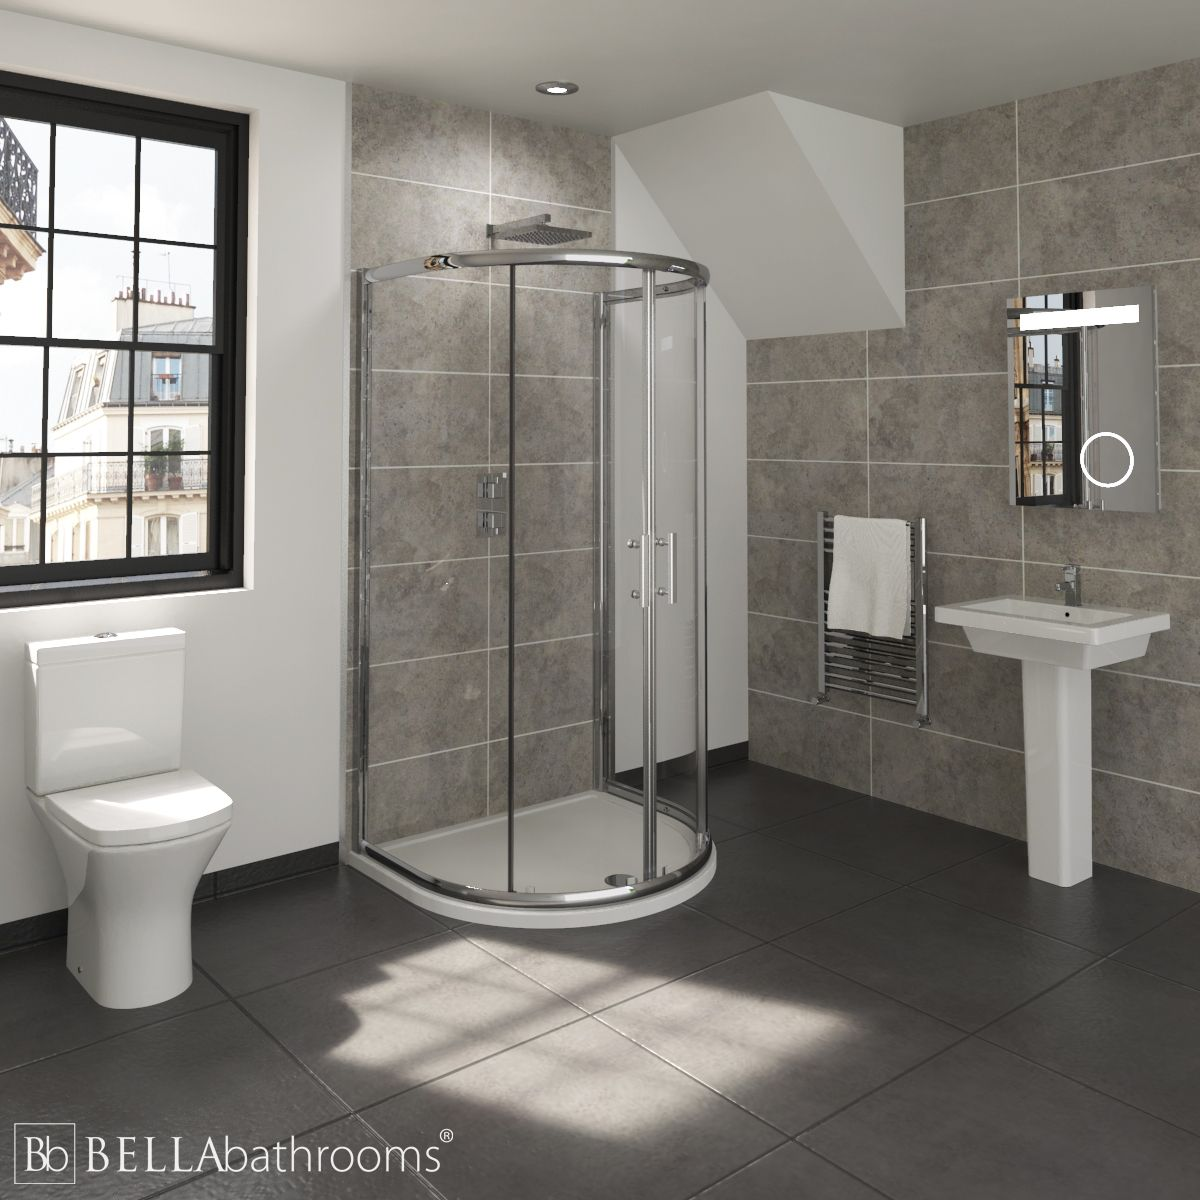 RAK Resort En-Suite with D Shaped Shower Enclosure